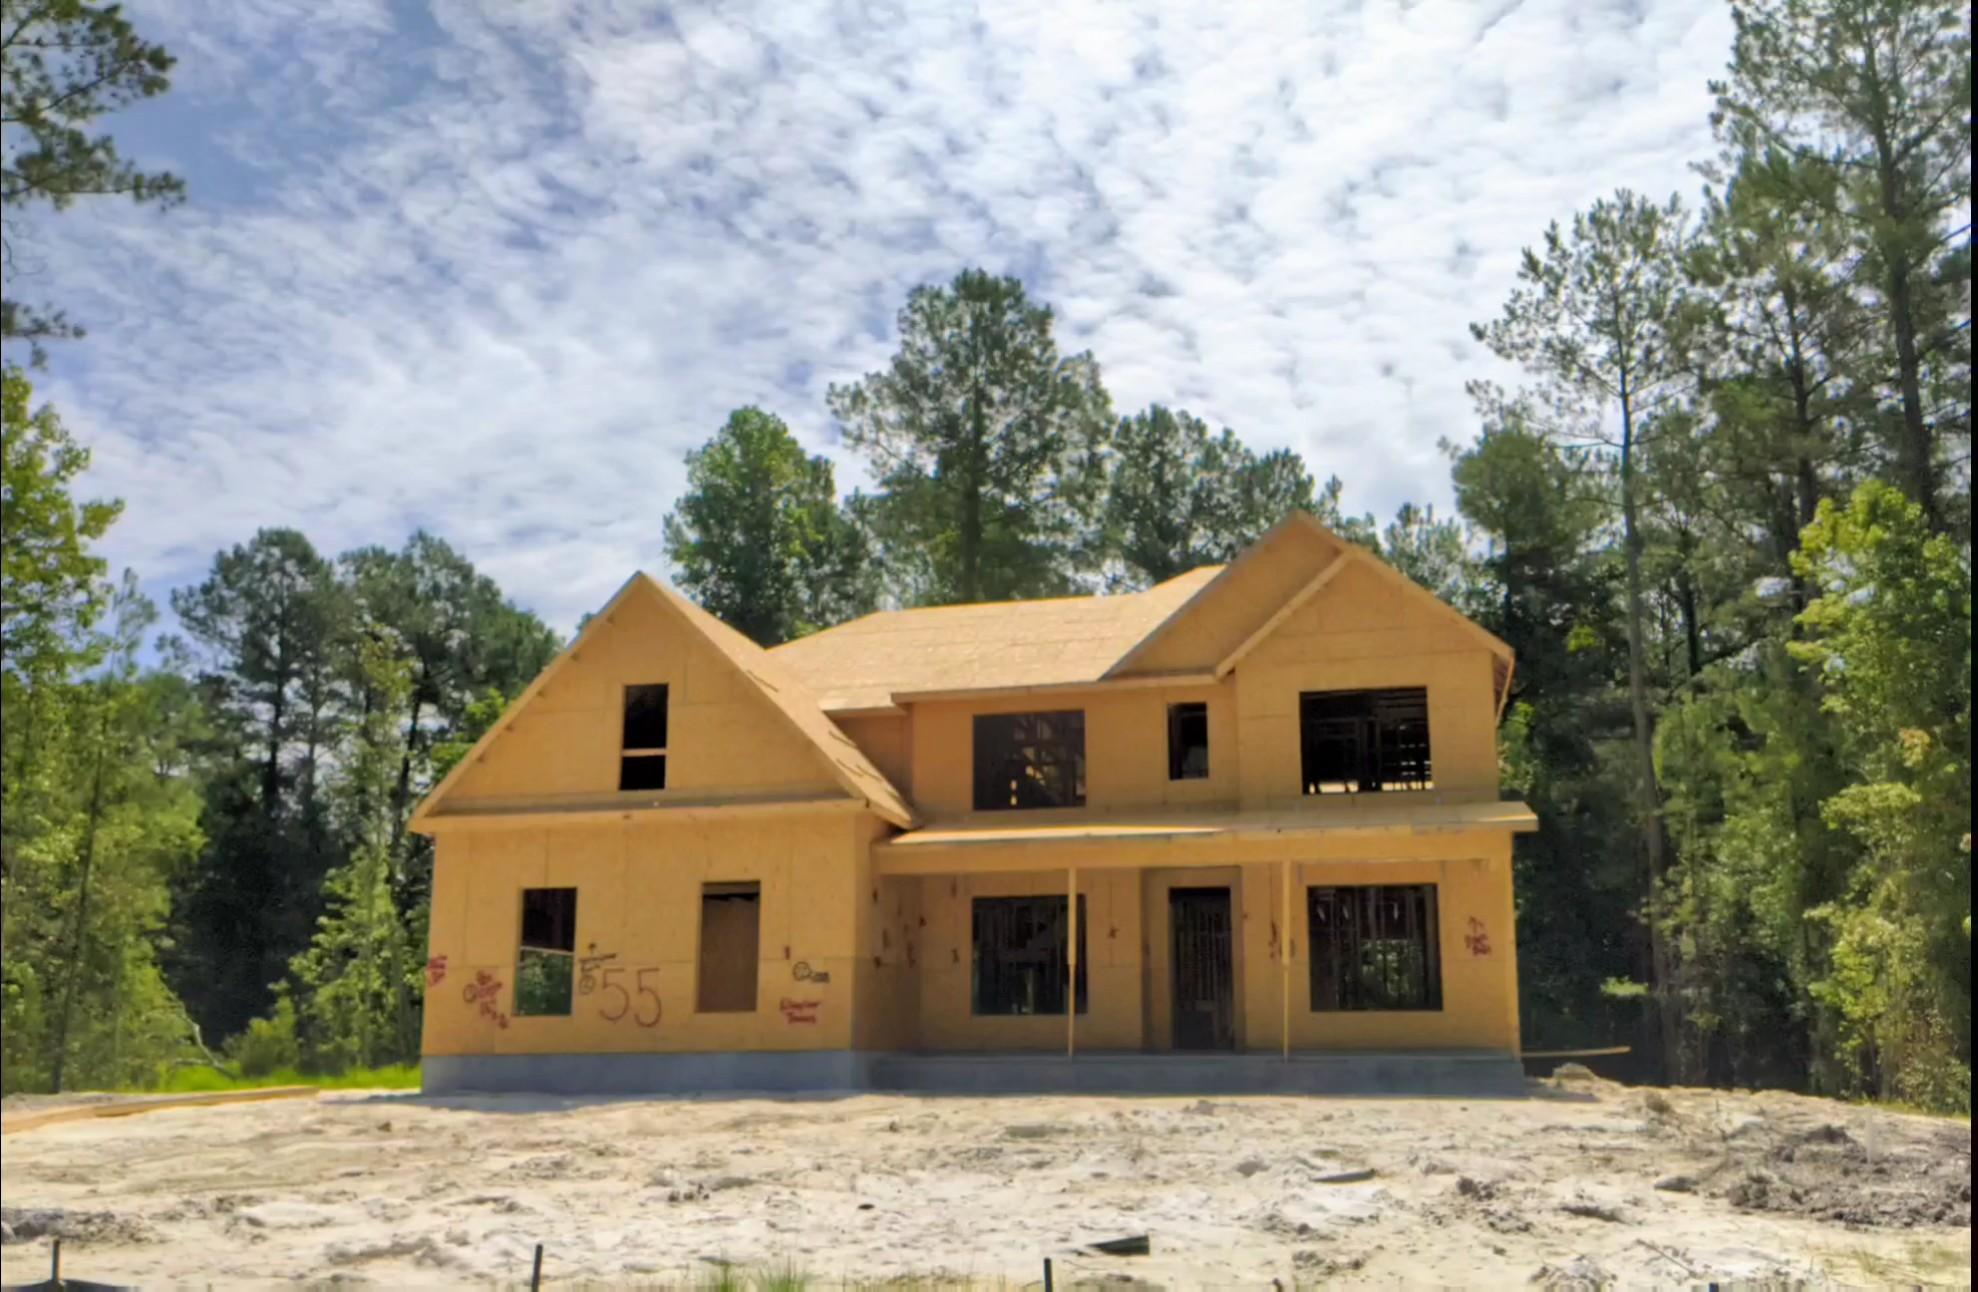 Carolina Bay Homes For Sale - 2032 Tacoma, Ridgeville, SC - 3